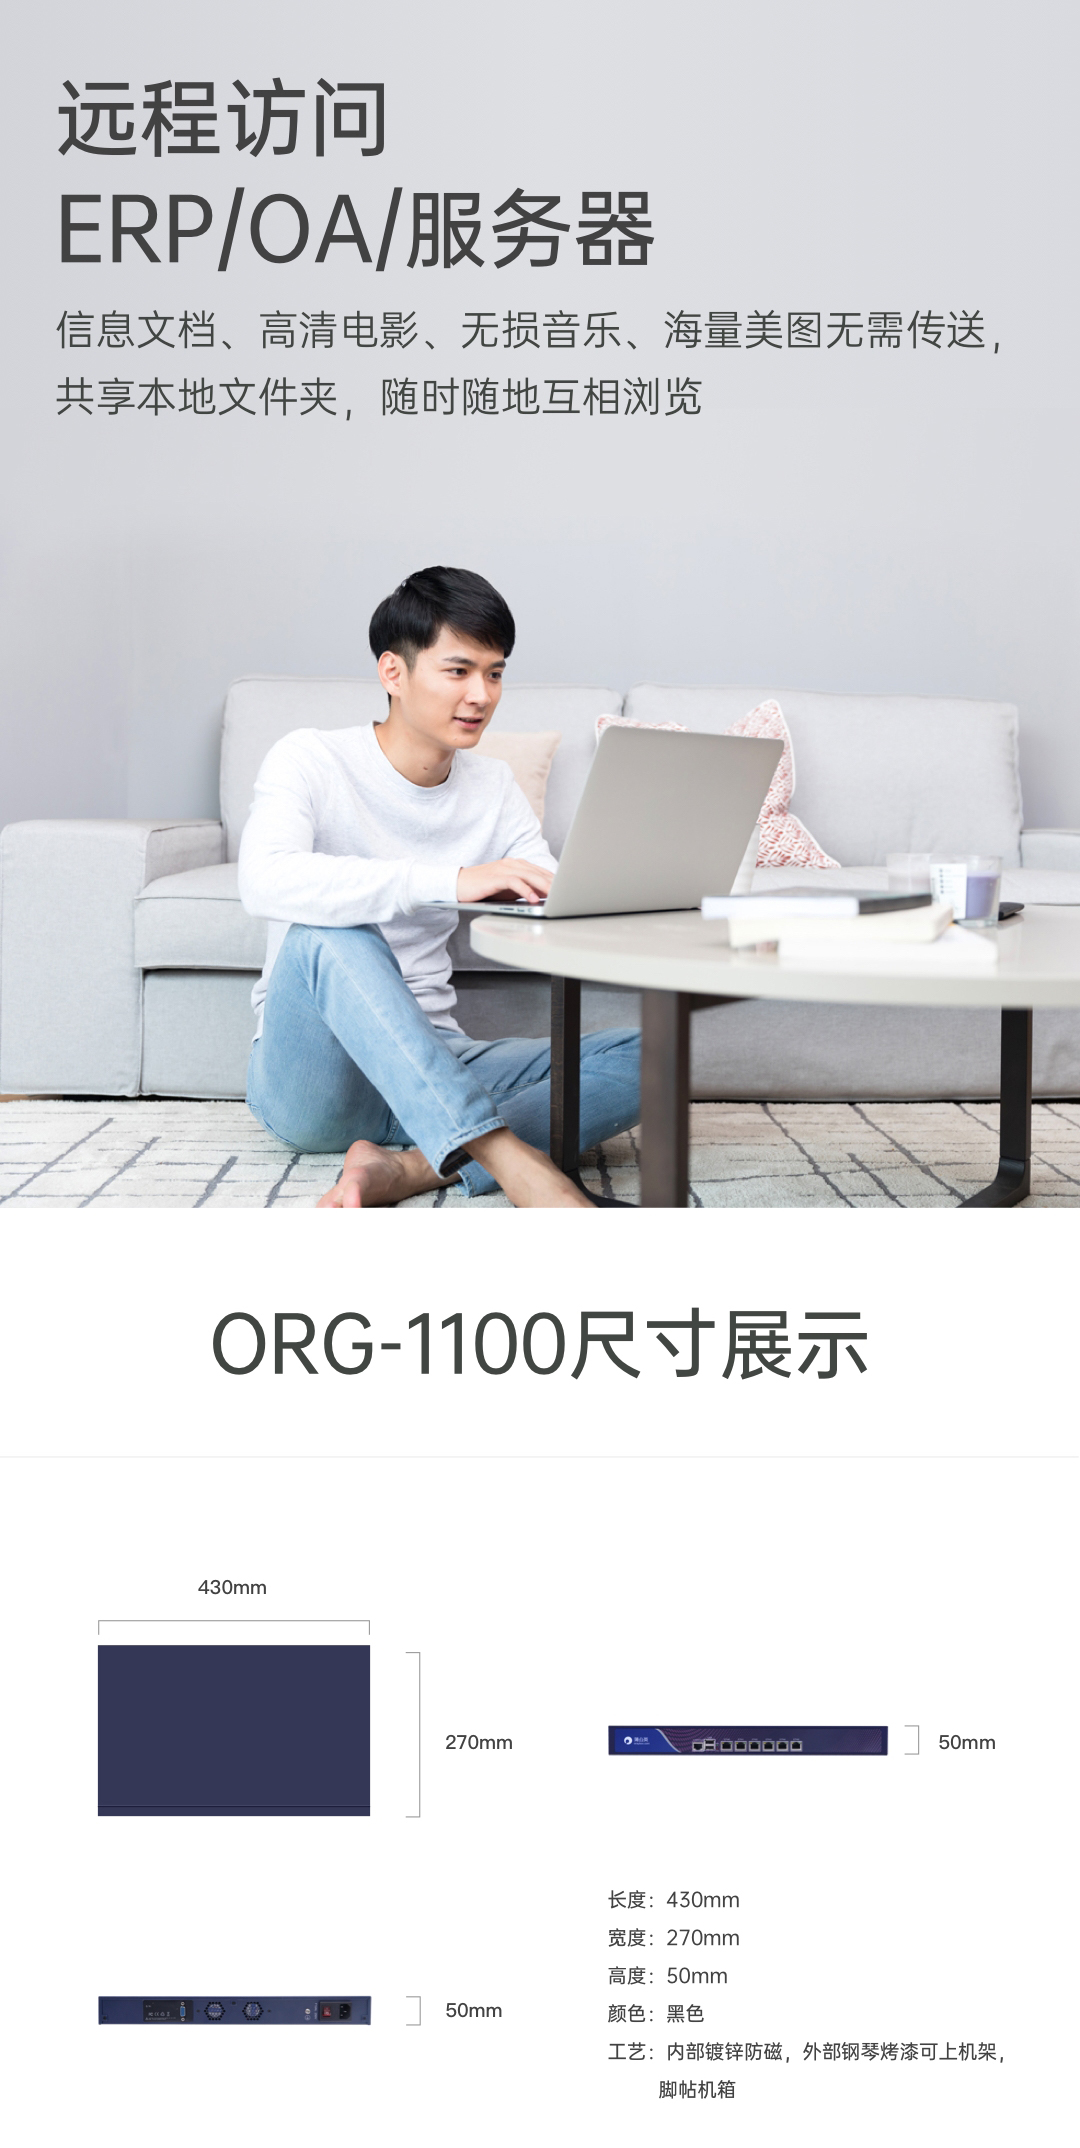 ORG-1100_08.jpg